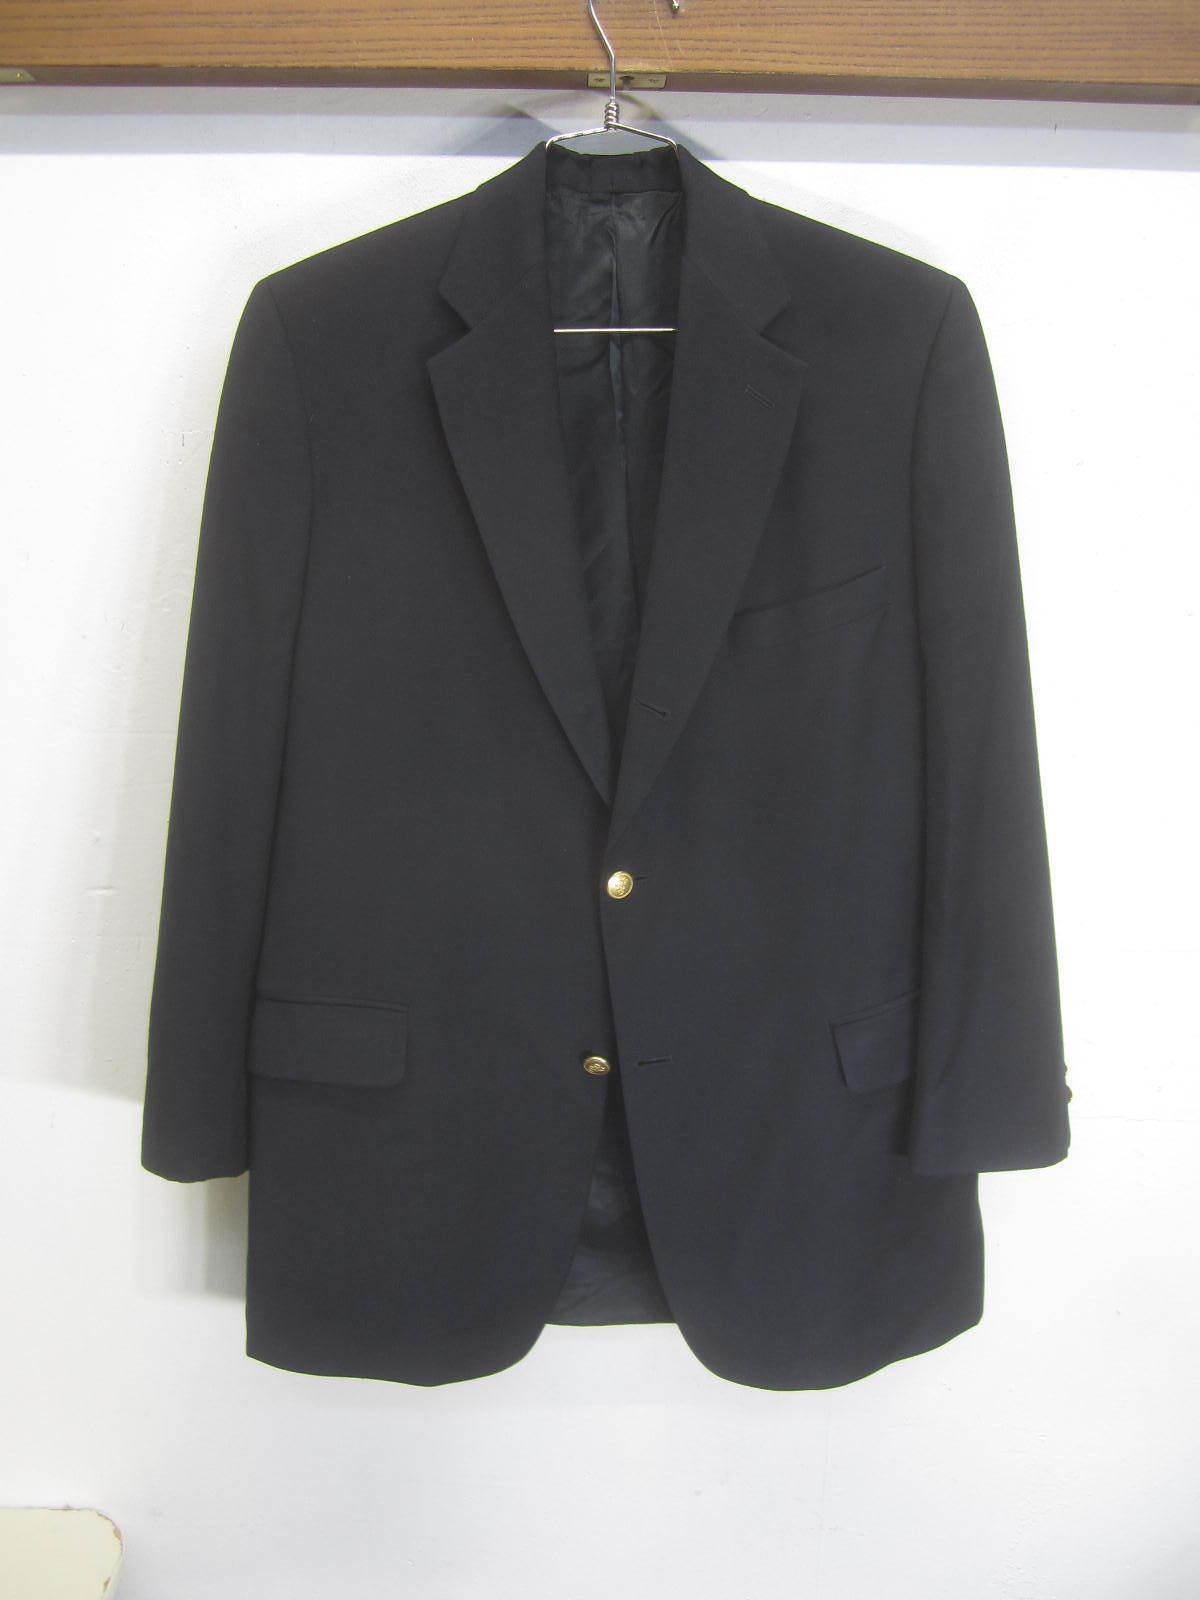 Vtg Brooks Brothers Blazer Sport Coat 3 btn wool/cashmere blend navy sz 42S